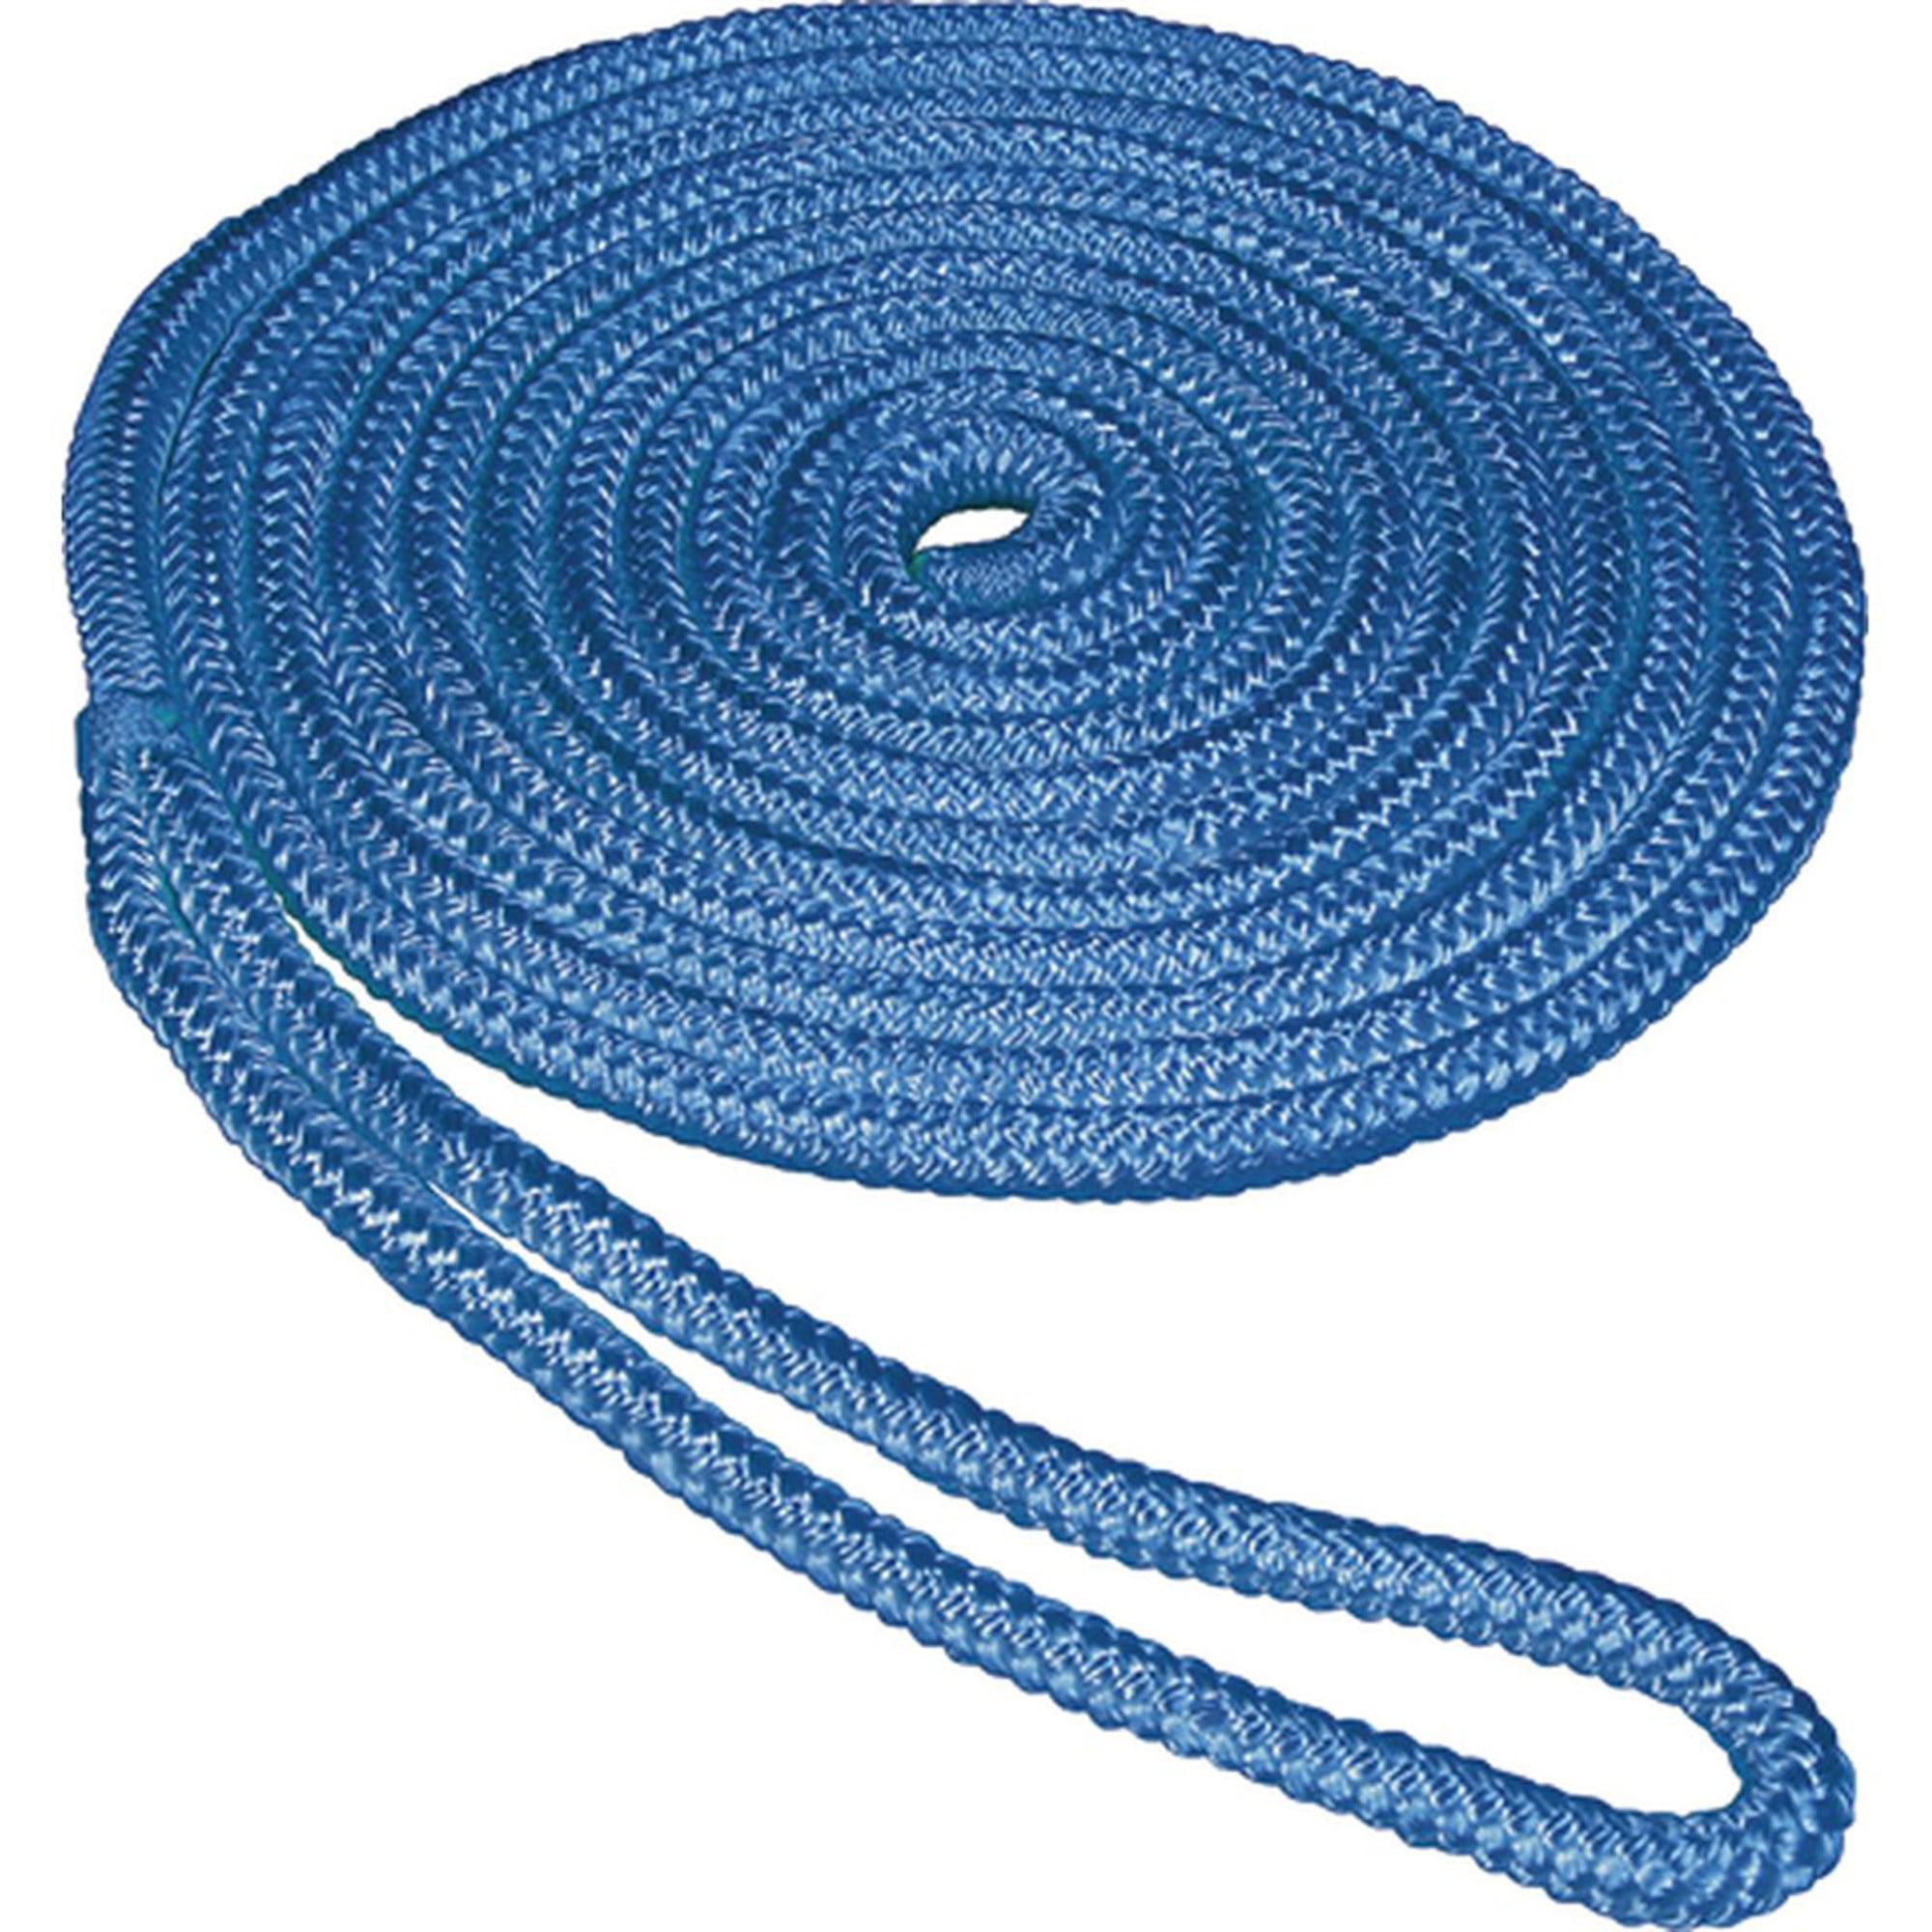 "SeaSense Double Braid Nylon Dock Line, 1 2"" x 15', 12"" Eye, Blue by Generic"